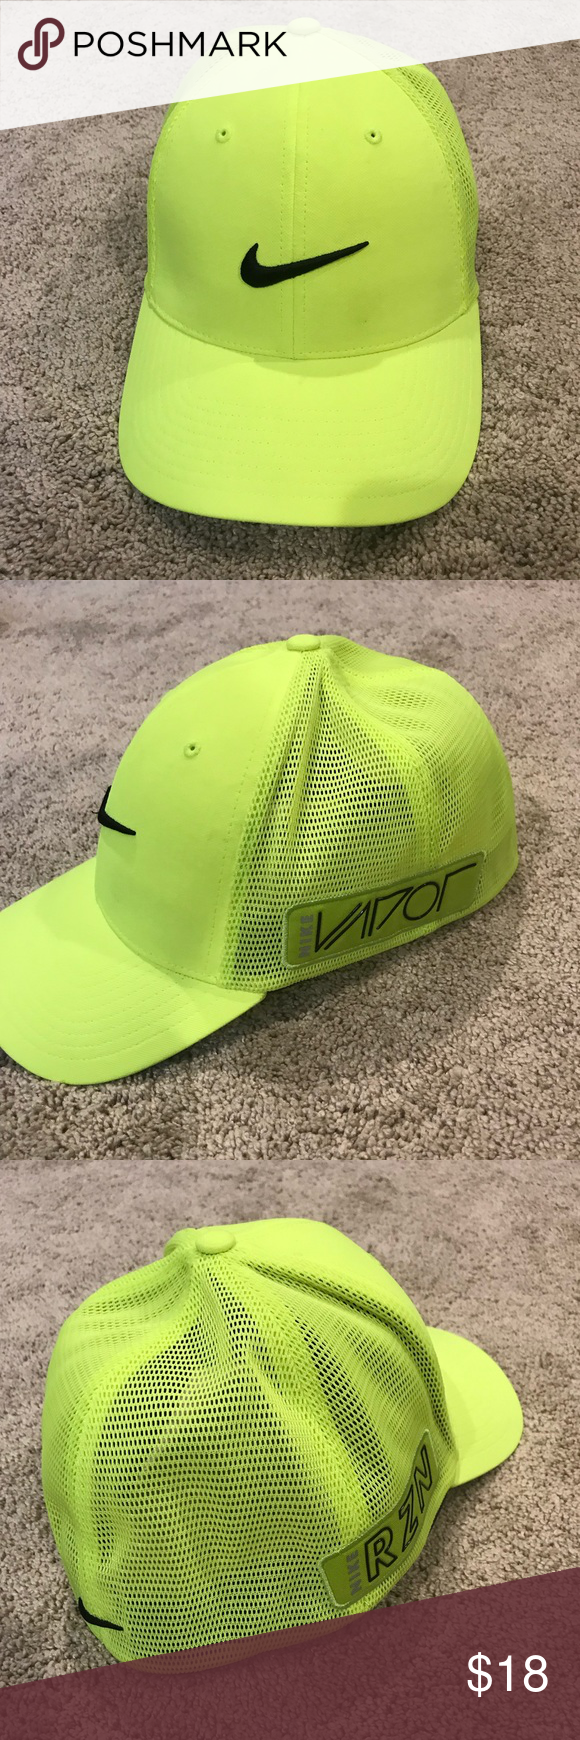 Nike Rzn Vapor Golf Hat Golf Hats Nike Accessories Nike